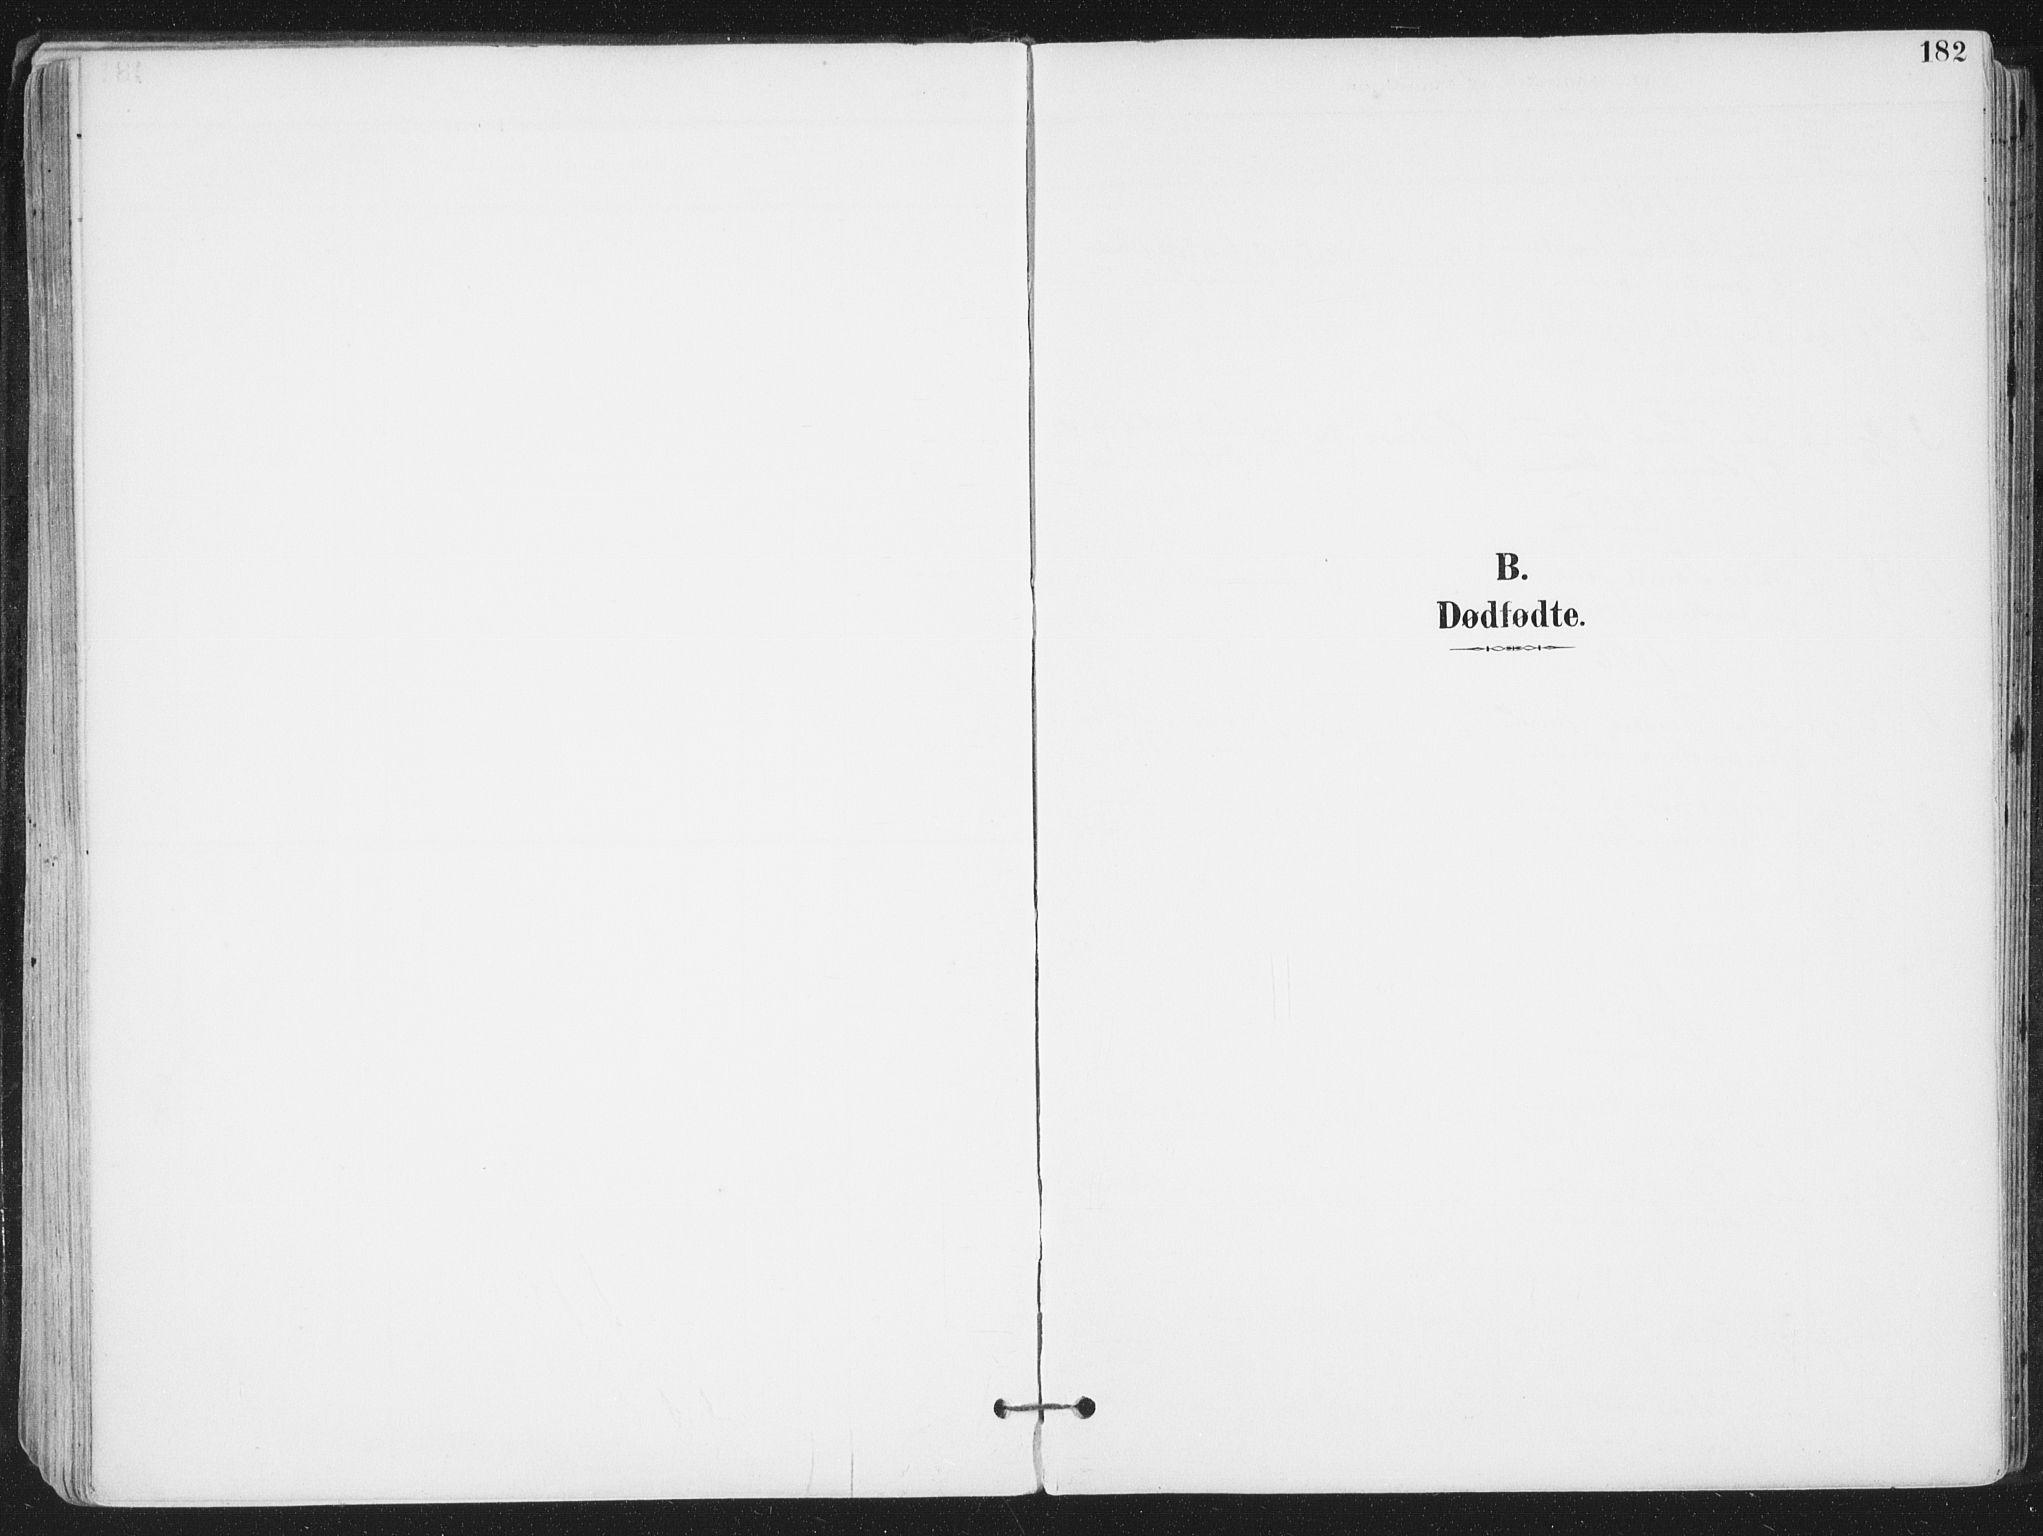 SAT, Ministerialprotokoller, klokkerbøker og fødselsregistre - Nordland, 802/L0055: Ministerialbok nr. 802A02, 1894-1915, s. 182